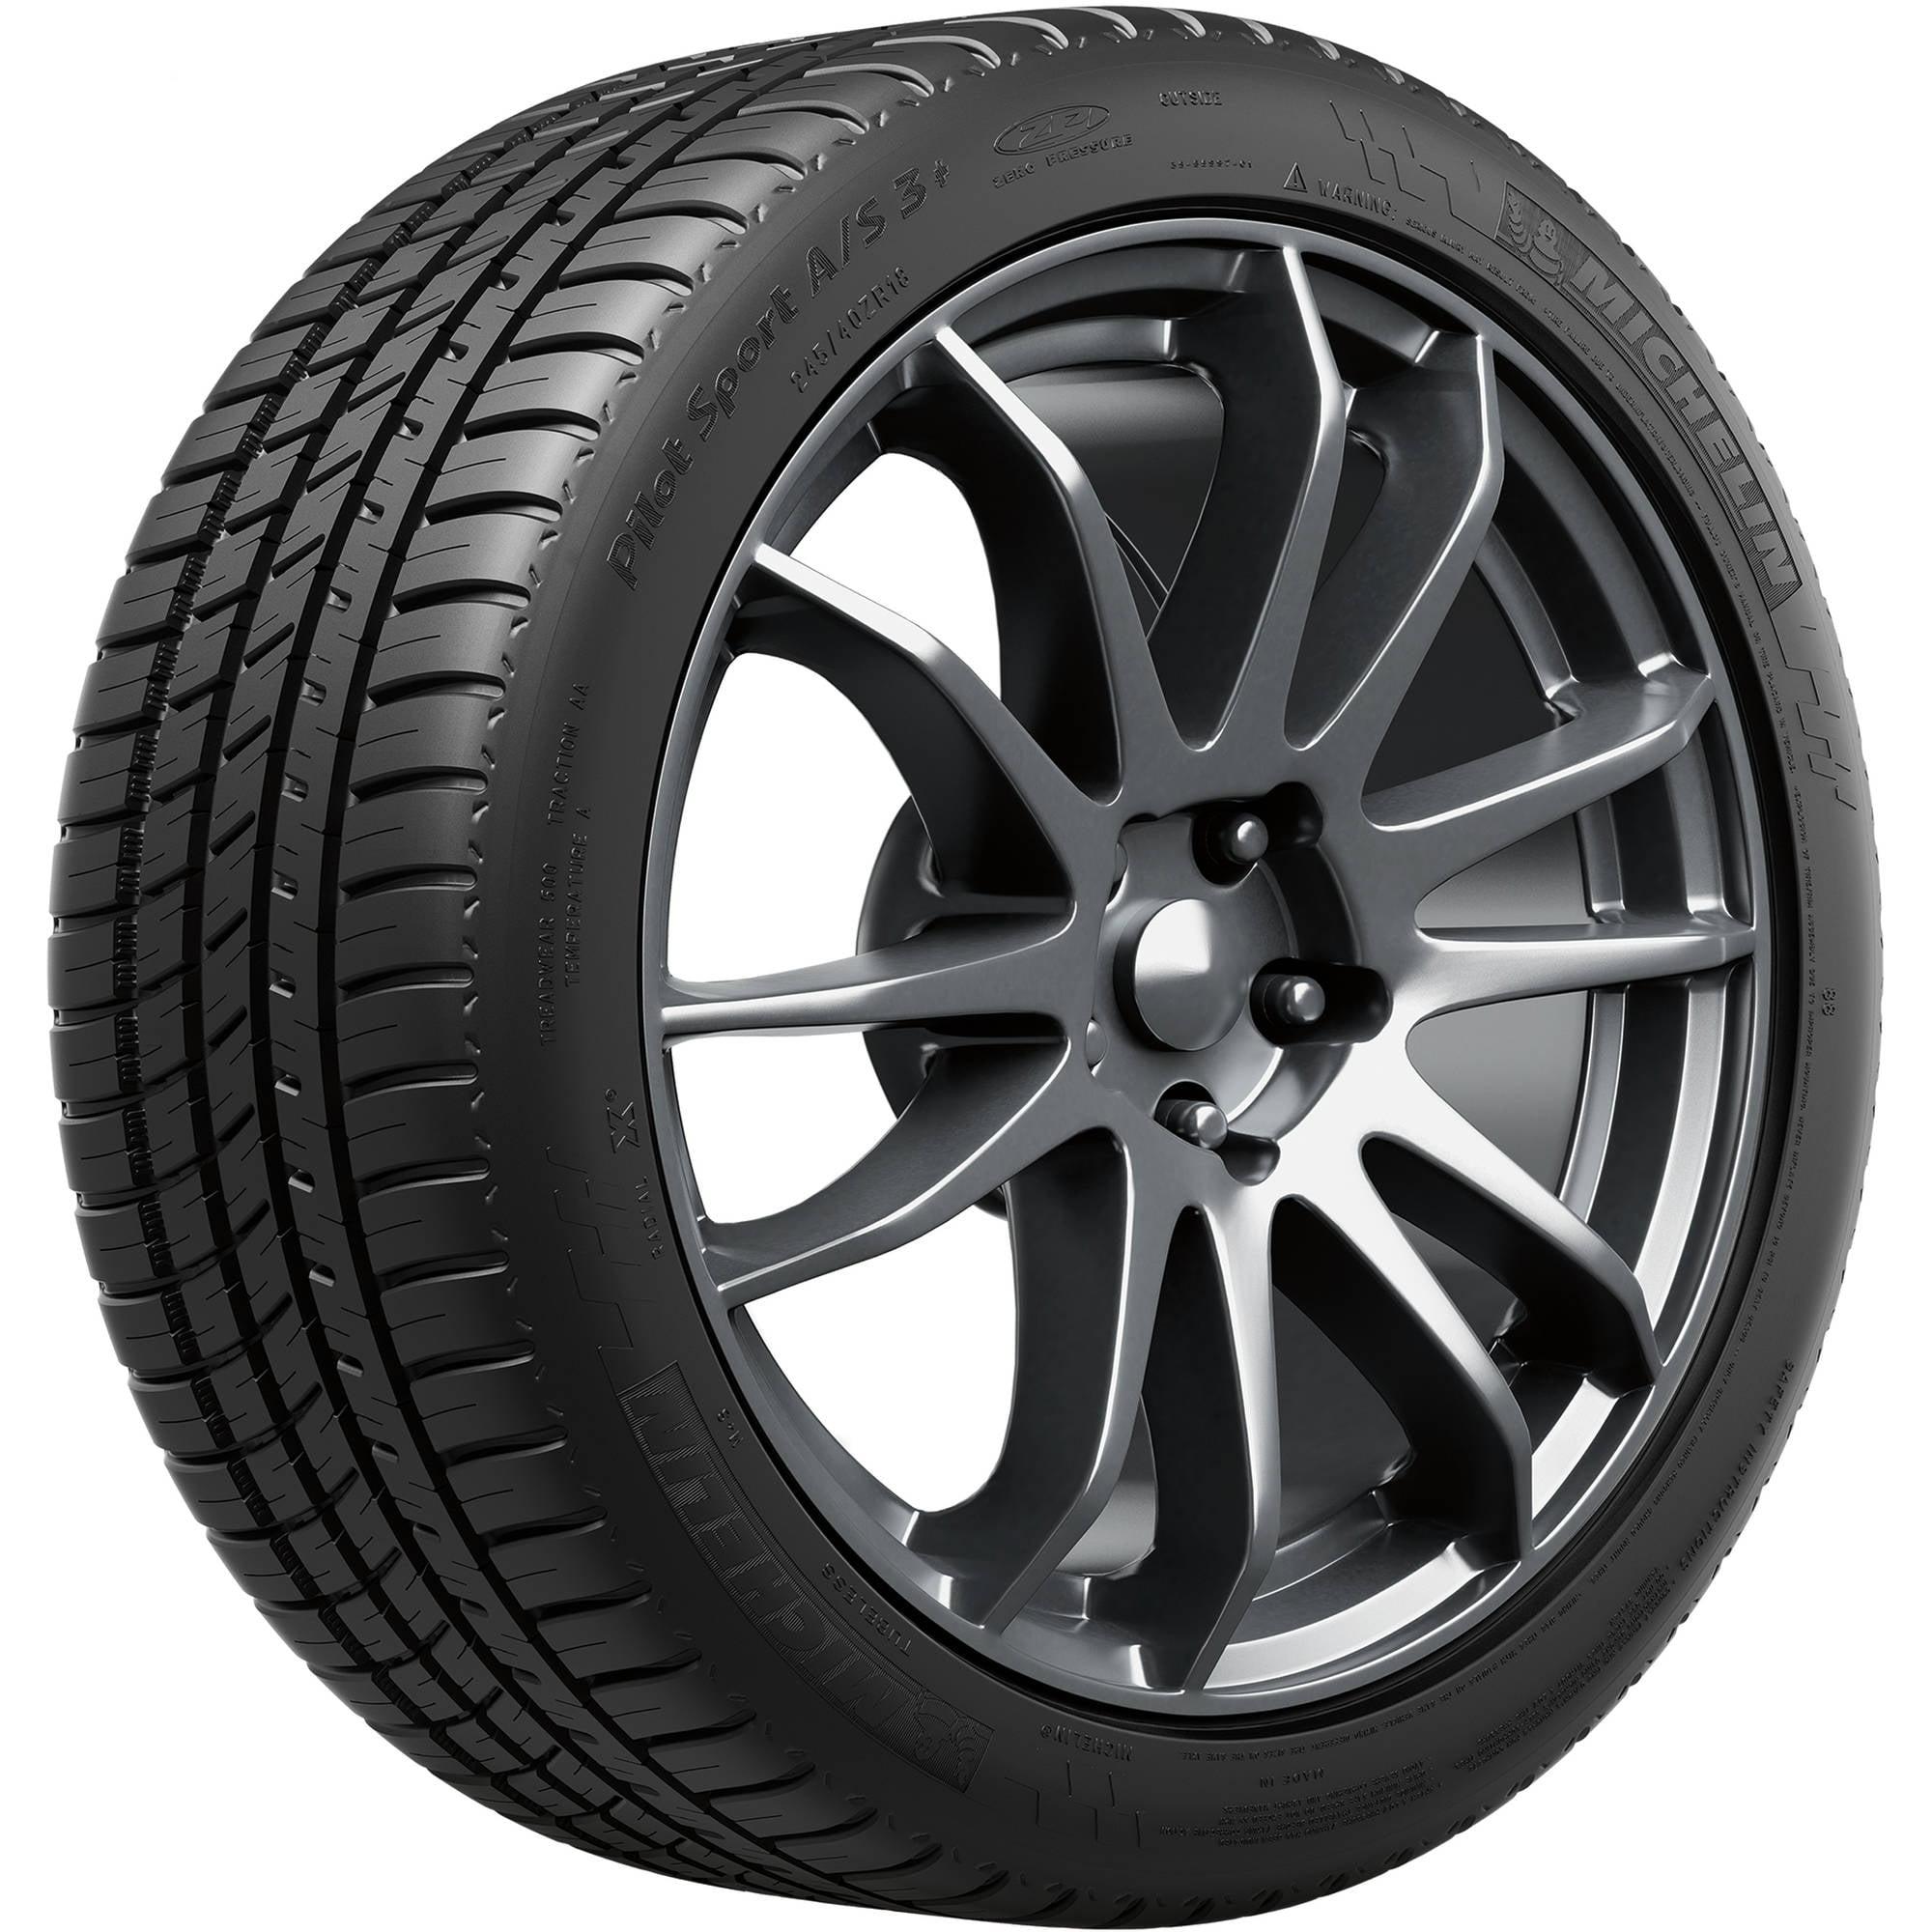 michelin pilot sport all season 3 ultra high performance tire 235 50zr18 97y. Black Bedroom Furniture Sets. Home Design Ideas